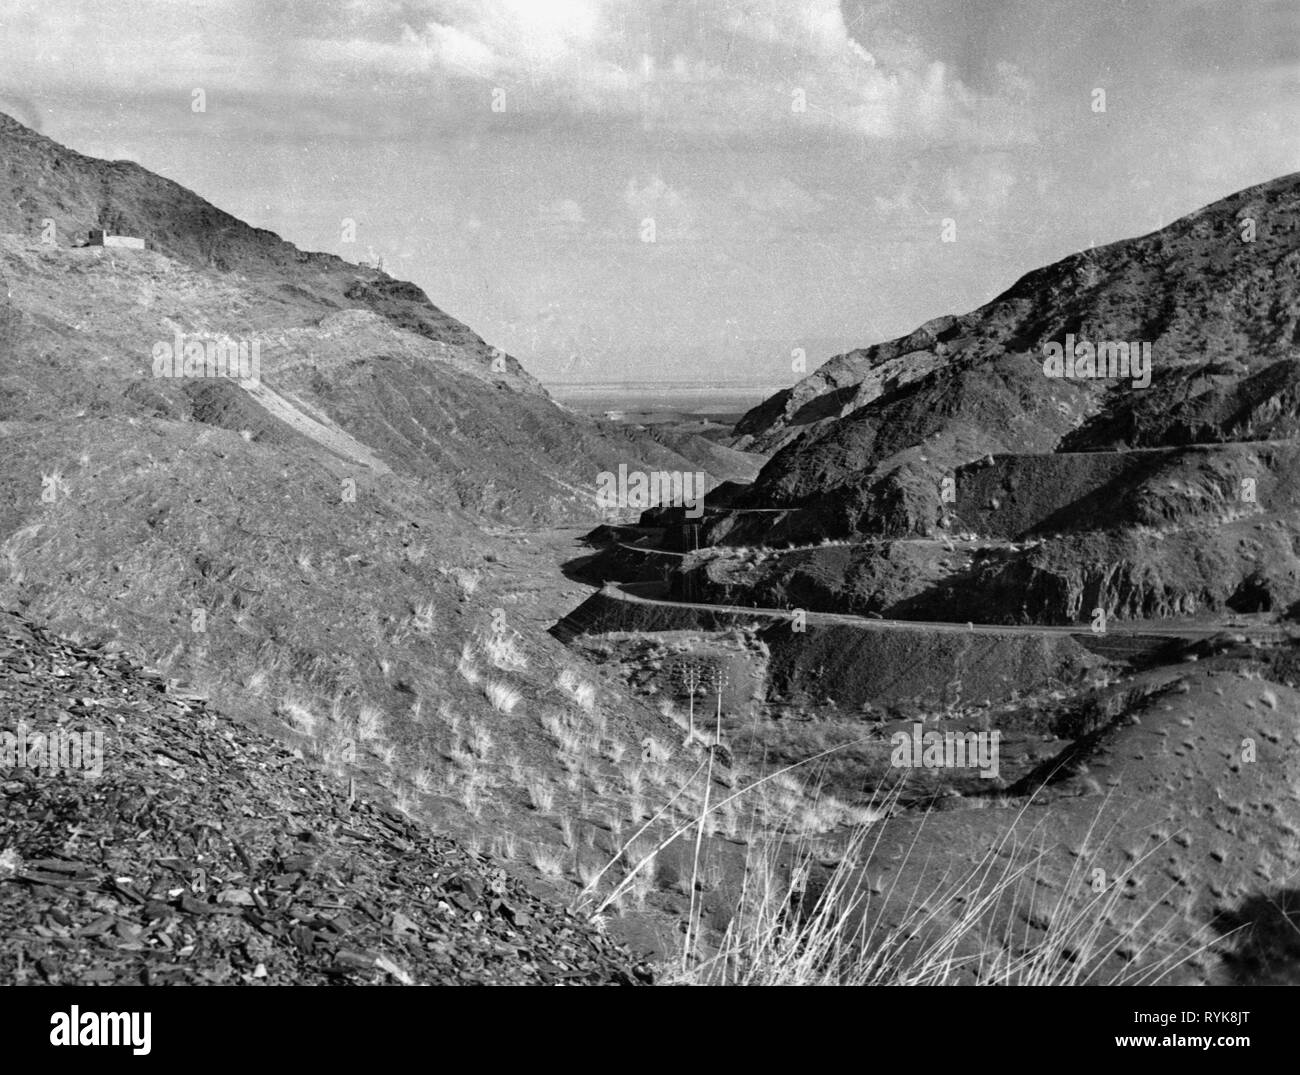 Geographie/Reisen, Pakistan, Verkehr, Straßen, Straße zum Khyber Pass, 1950er Jahre, Additional-Rights - Clearance-Info - Not-Available Stockbild